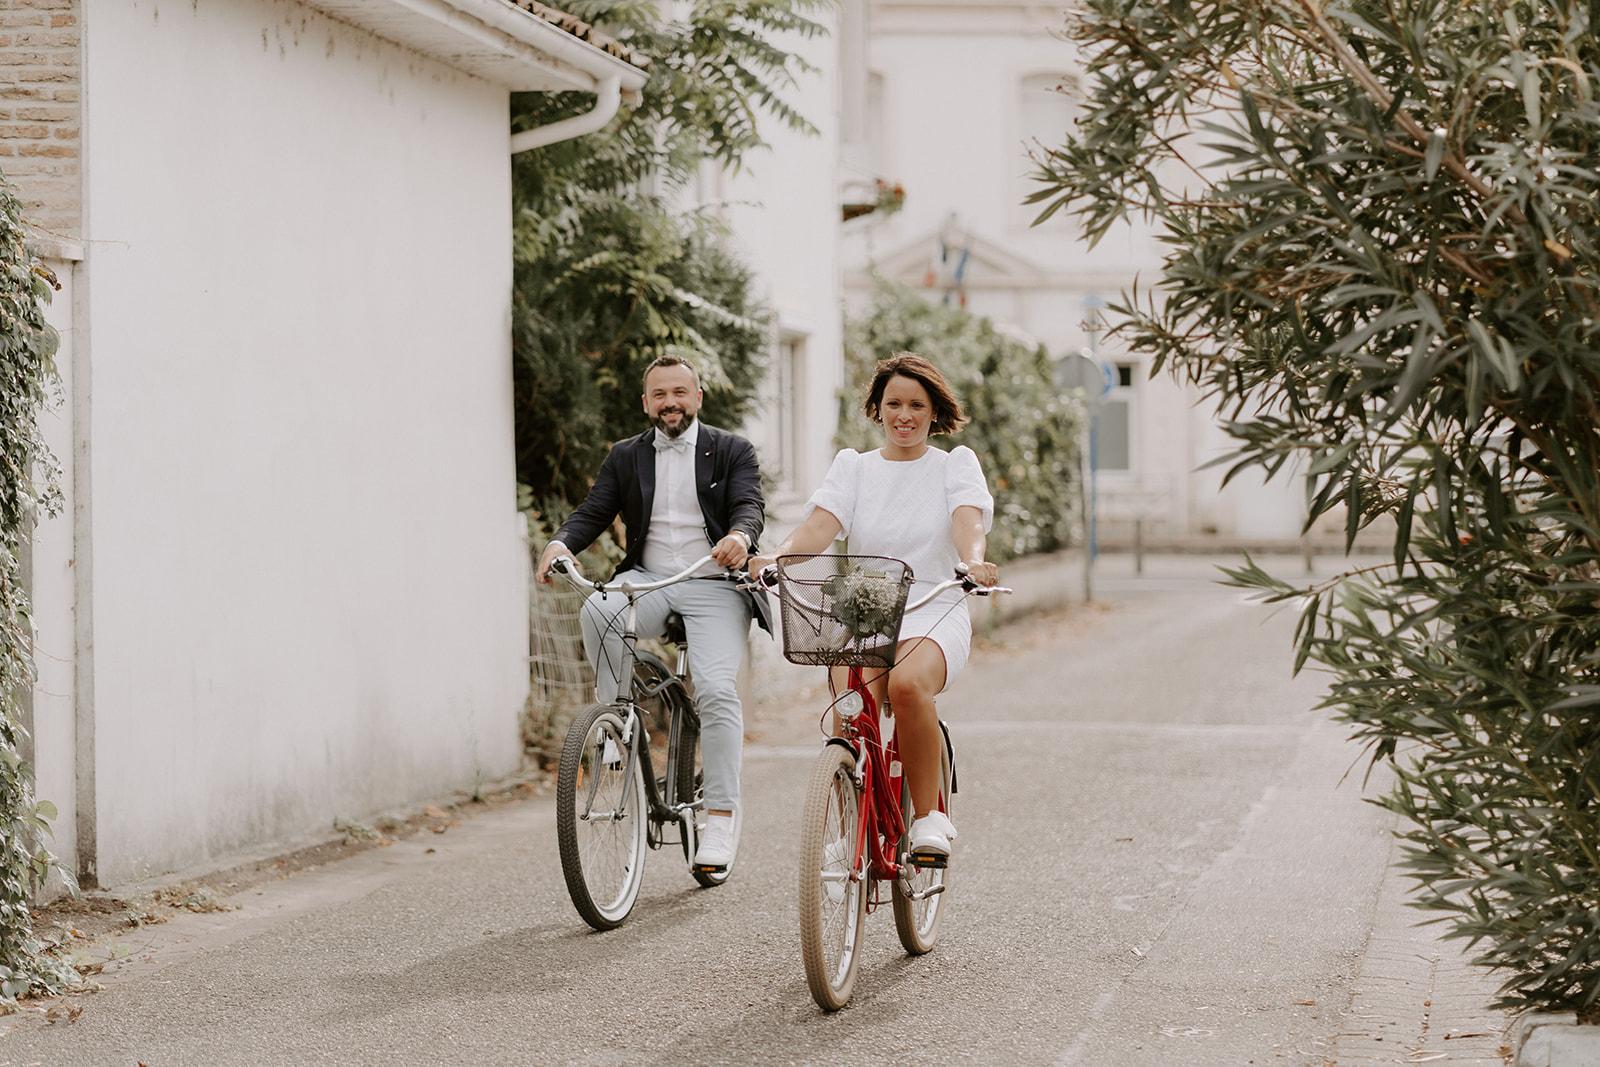 Mariage-bassin-Arcachon-activite-velo-couple